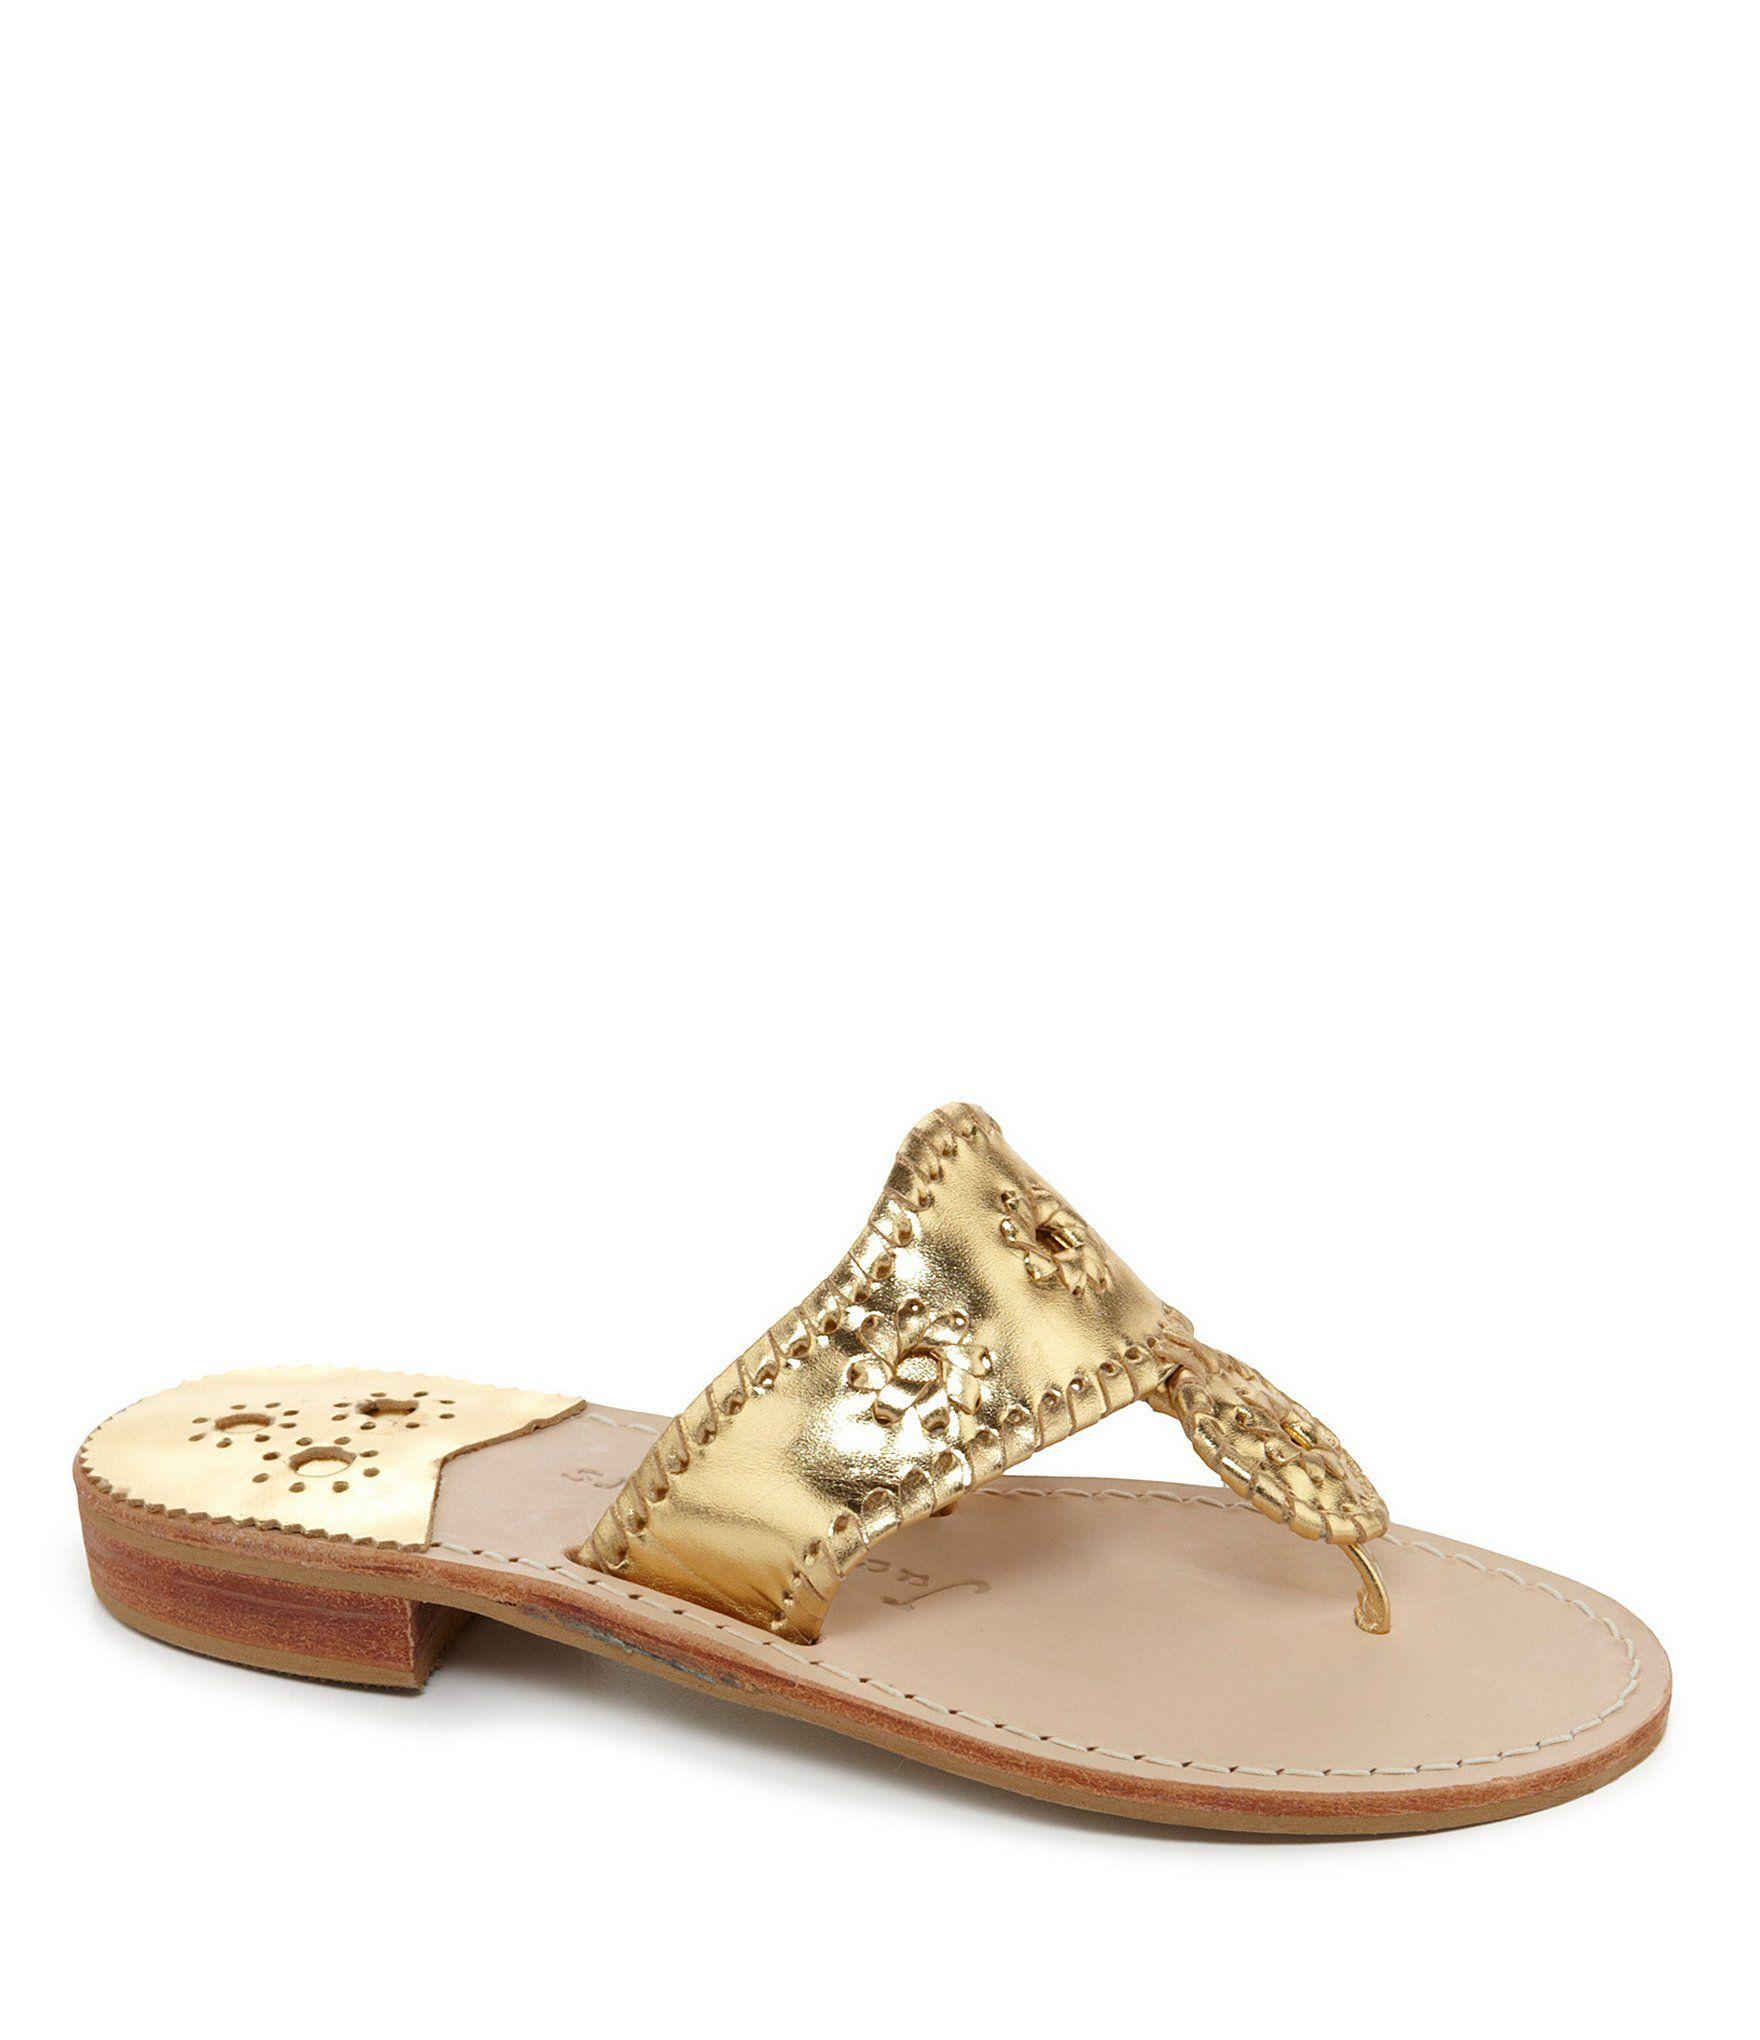 Jack Rogers Hamptons Metallic Leather Whipstitched Sandals | Dillard's